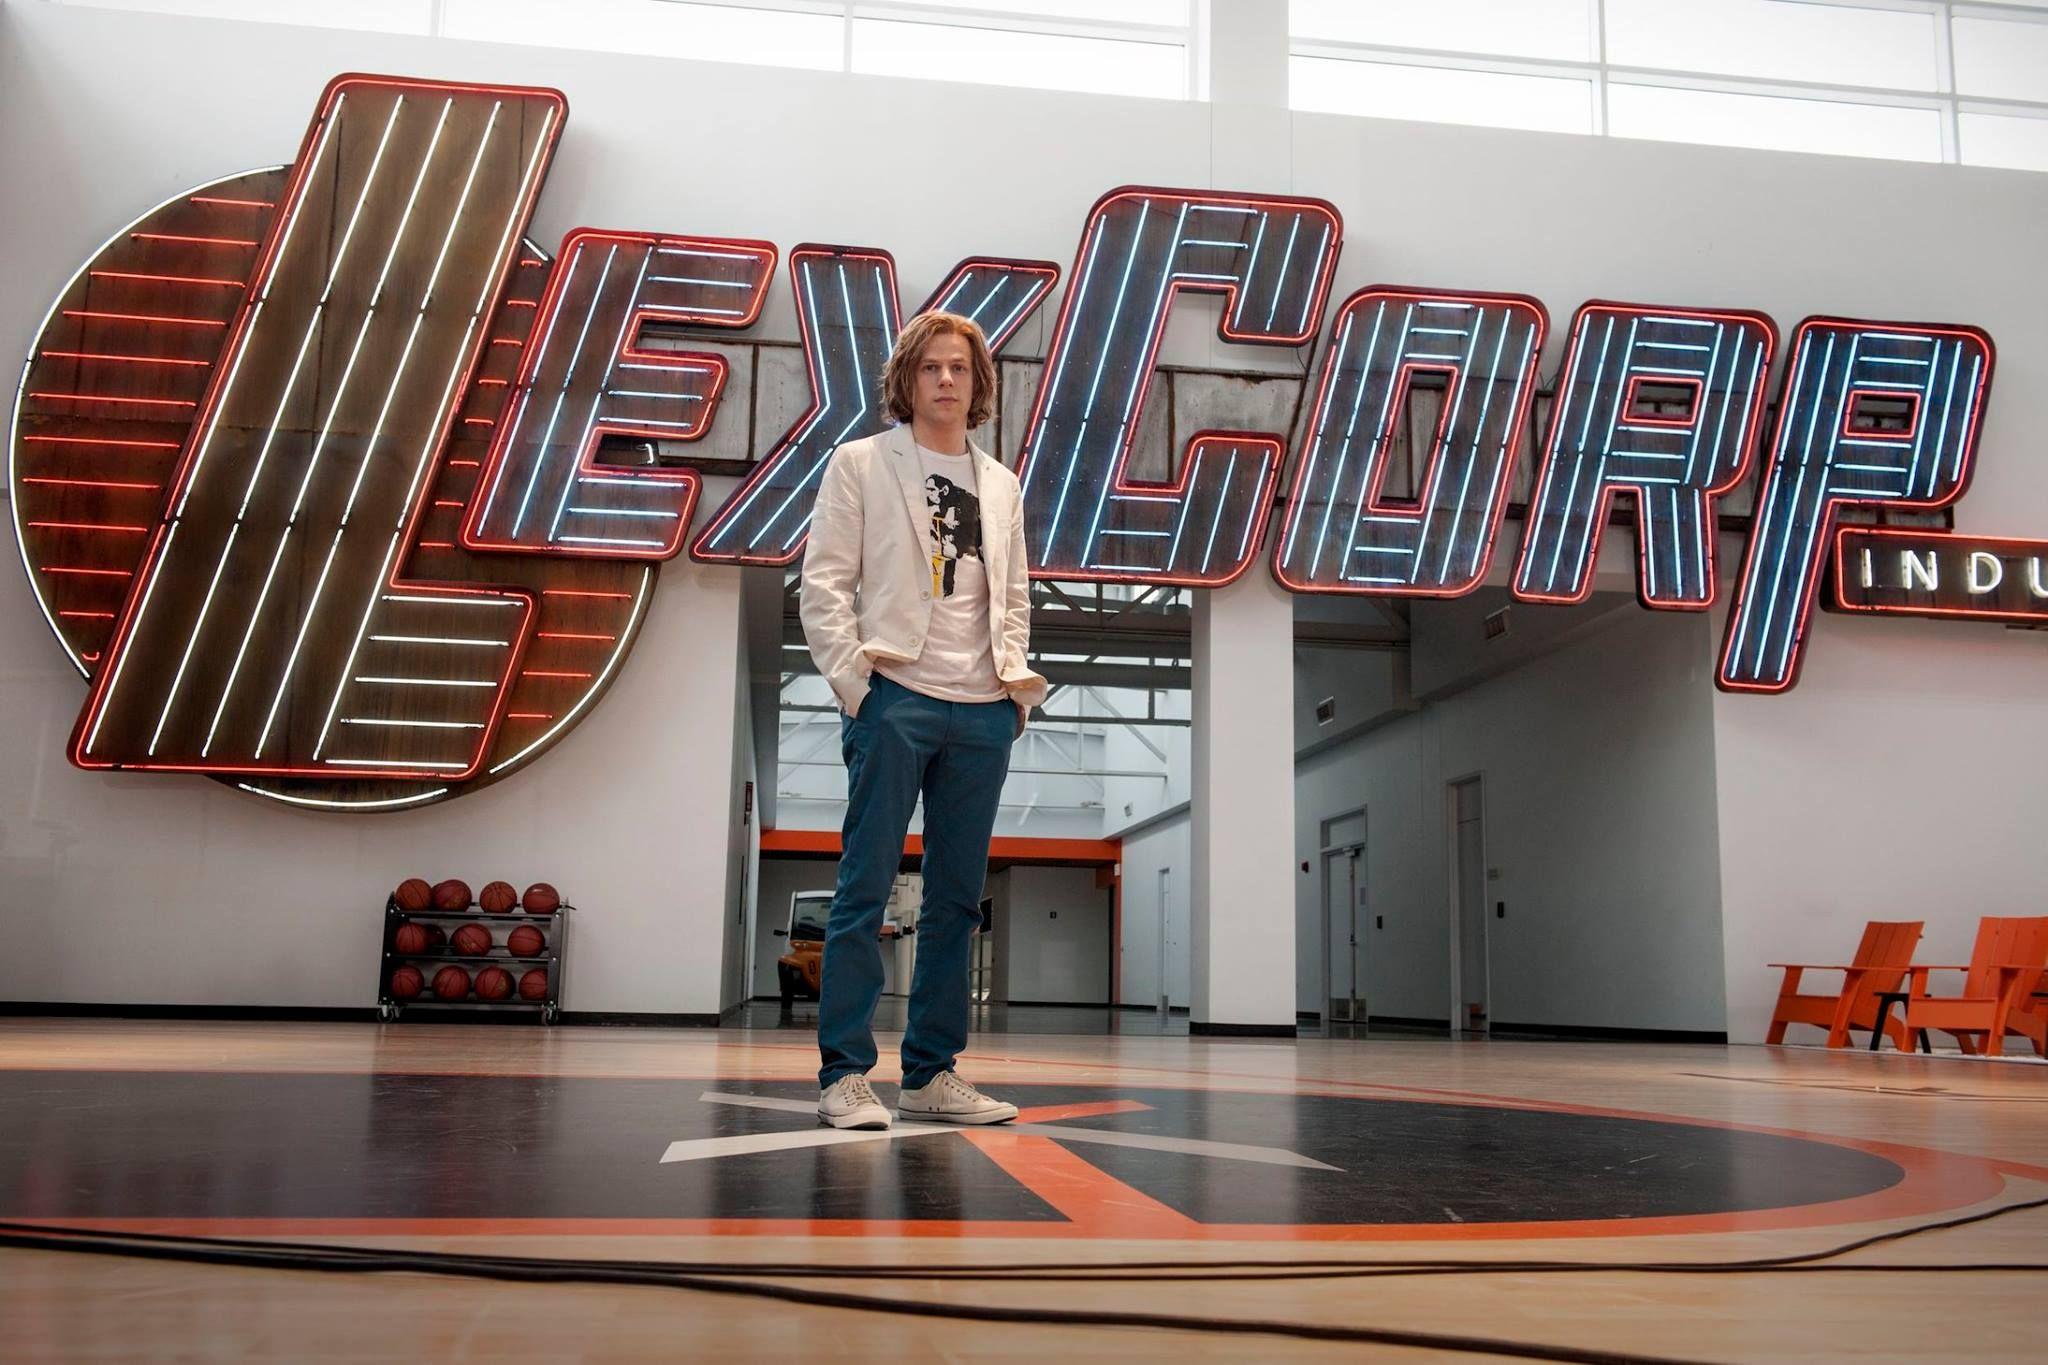 #JesseEisenberg è LEX LUTHOR in #BatmanVSuperman. Nei cinema nel 2016.